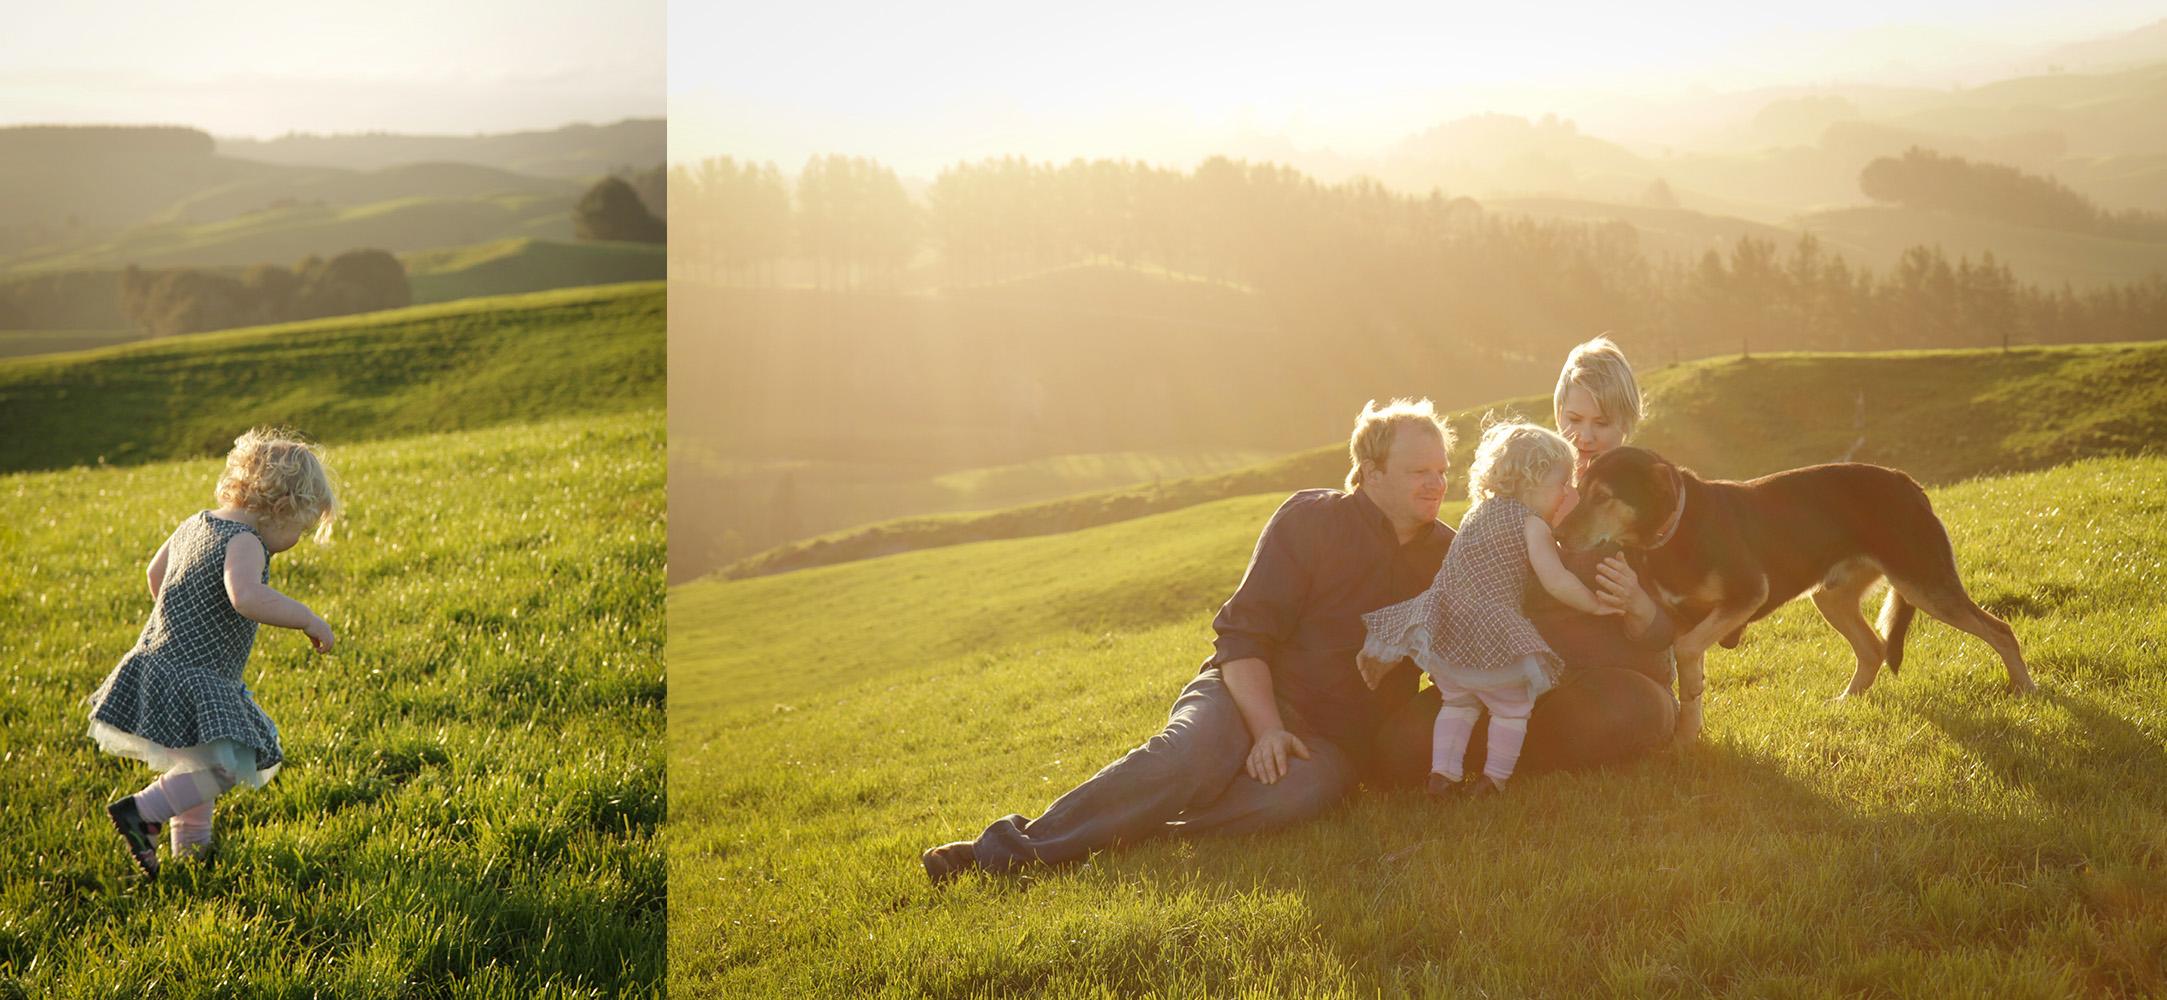 Hamilton-family-lifestyle-photographer-on-top-of-the-world.jpg